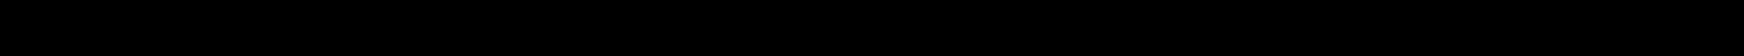 NeutrafaceSlabTxGR-Bold.otf